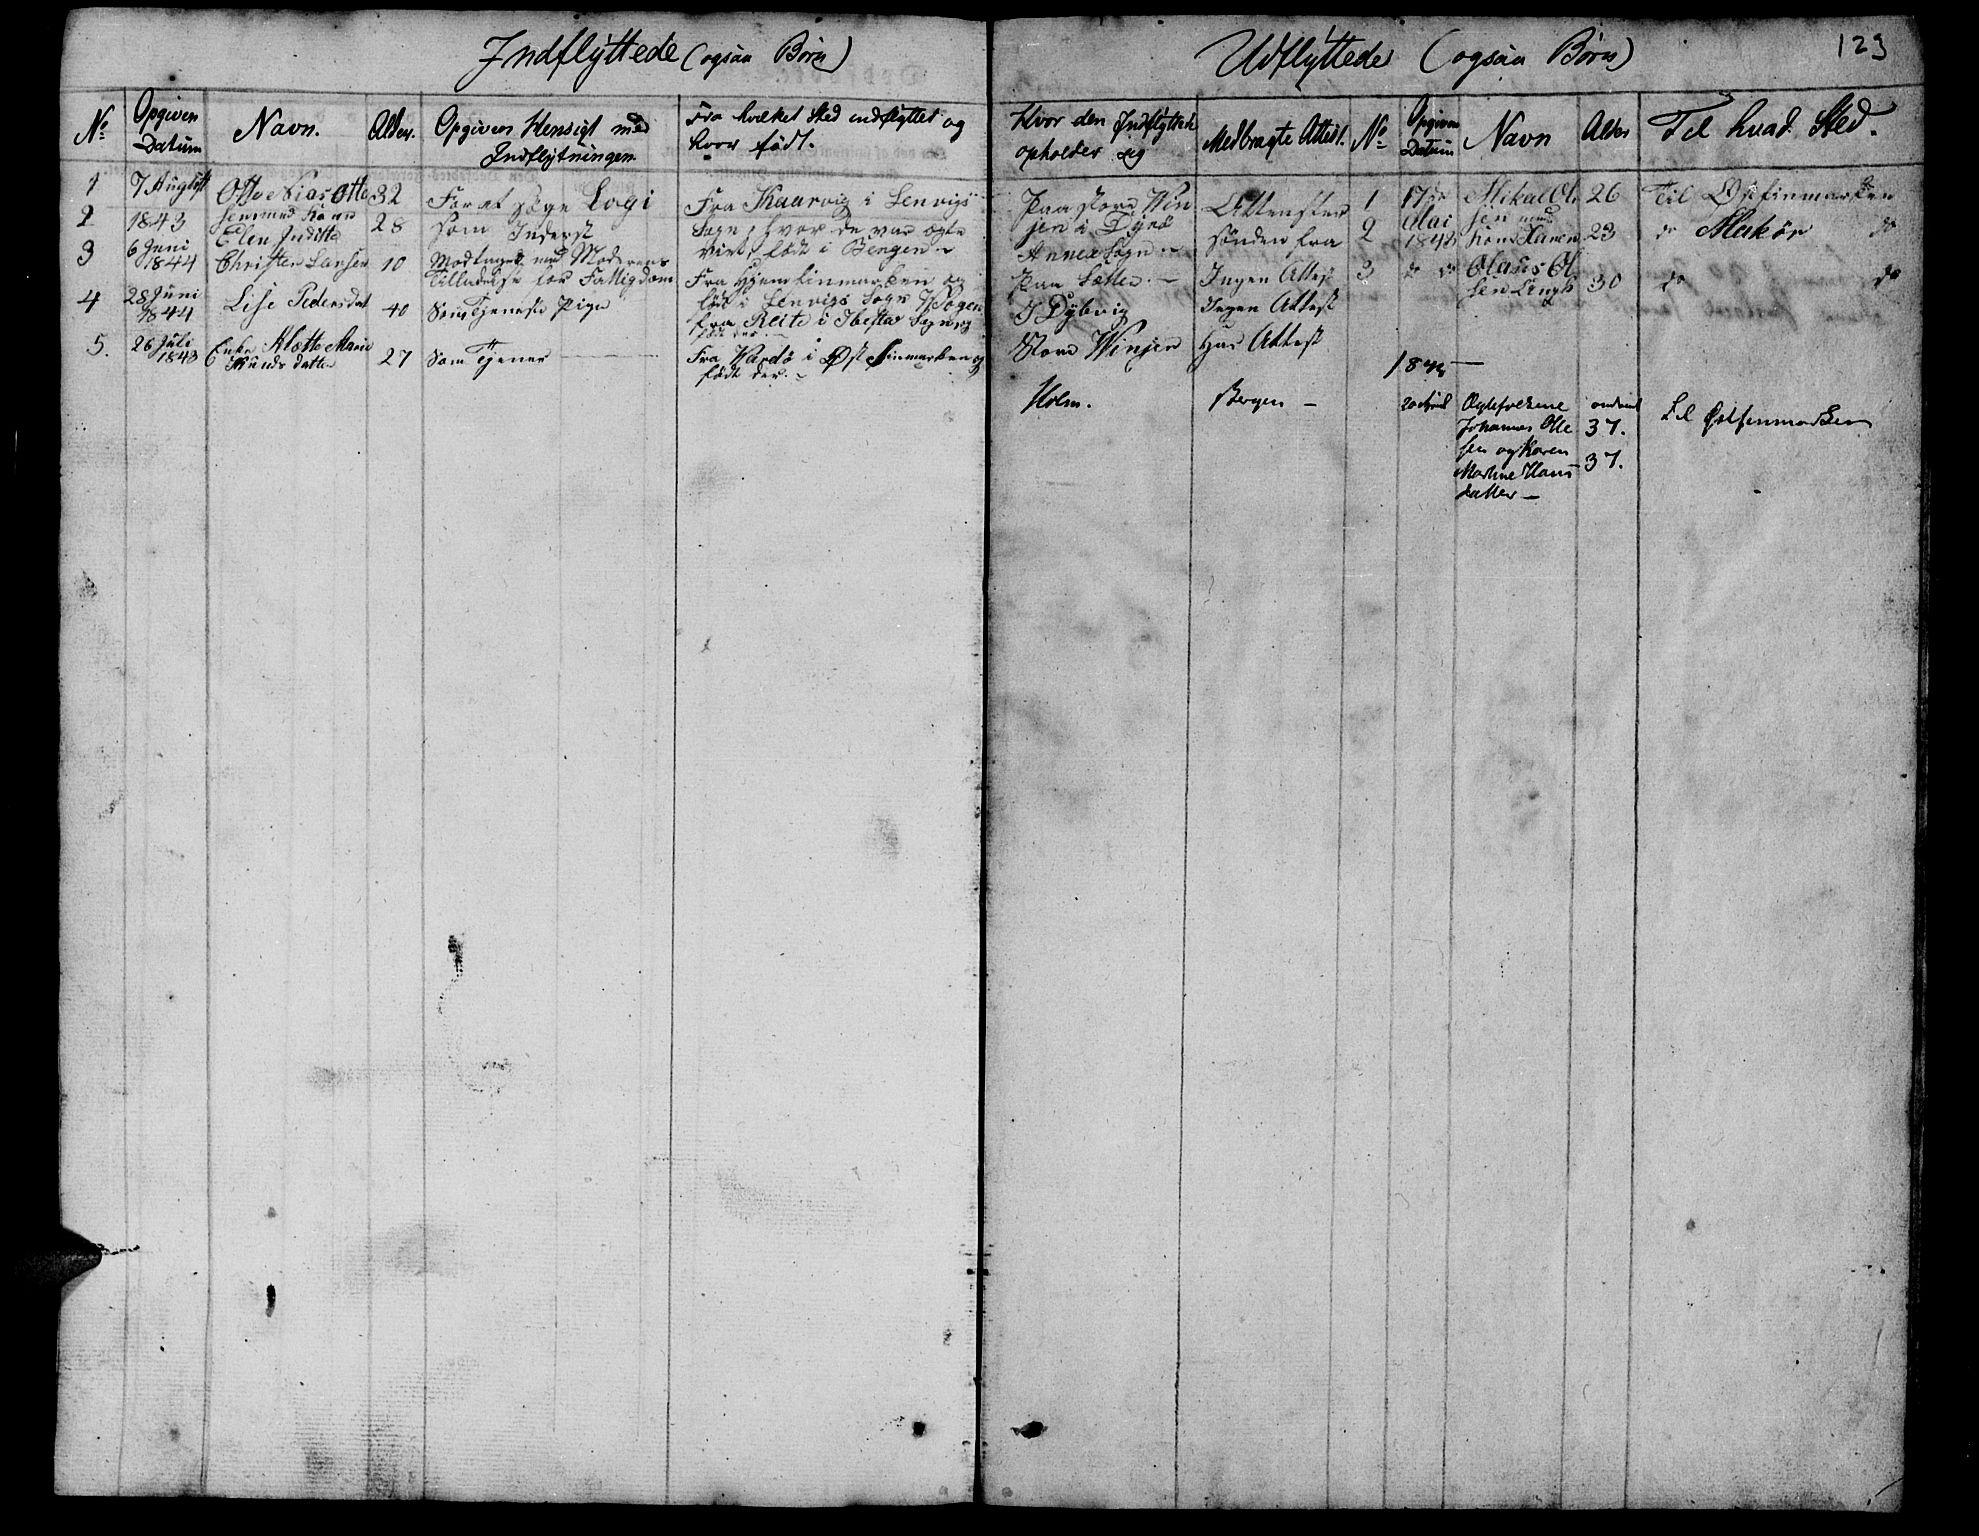 SATØ, Tranøy sokneprestkontor, I/Ia/Iab/L0010klokker: Klokkerbok nr. 10, 1835-1844, s. 123